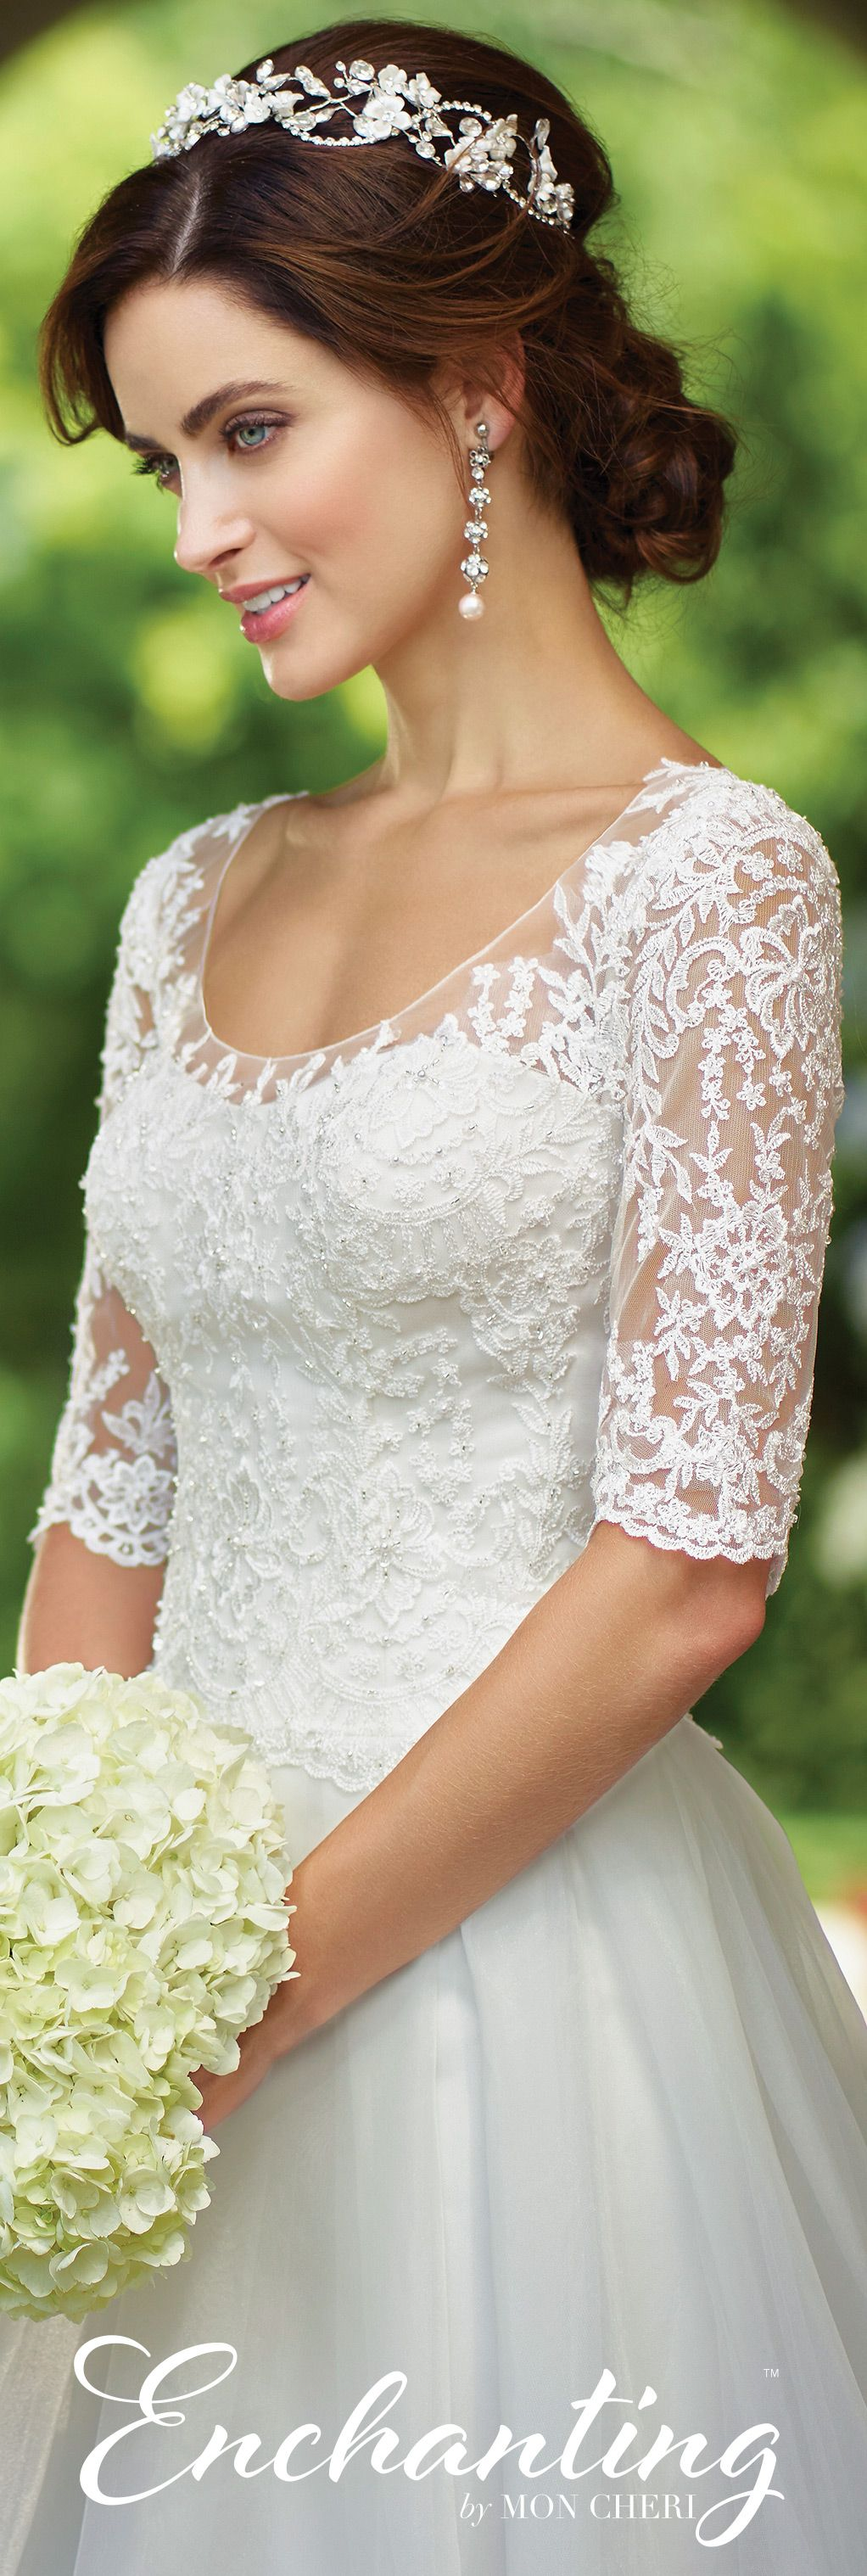 Organza aline wedding dress enchanting by mon cheri